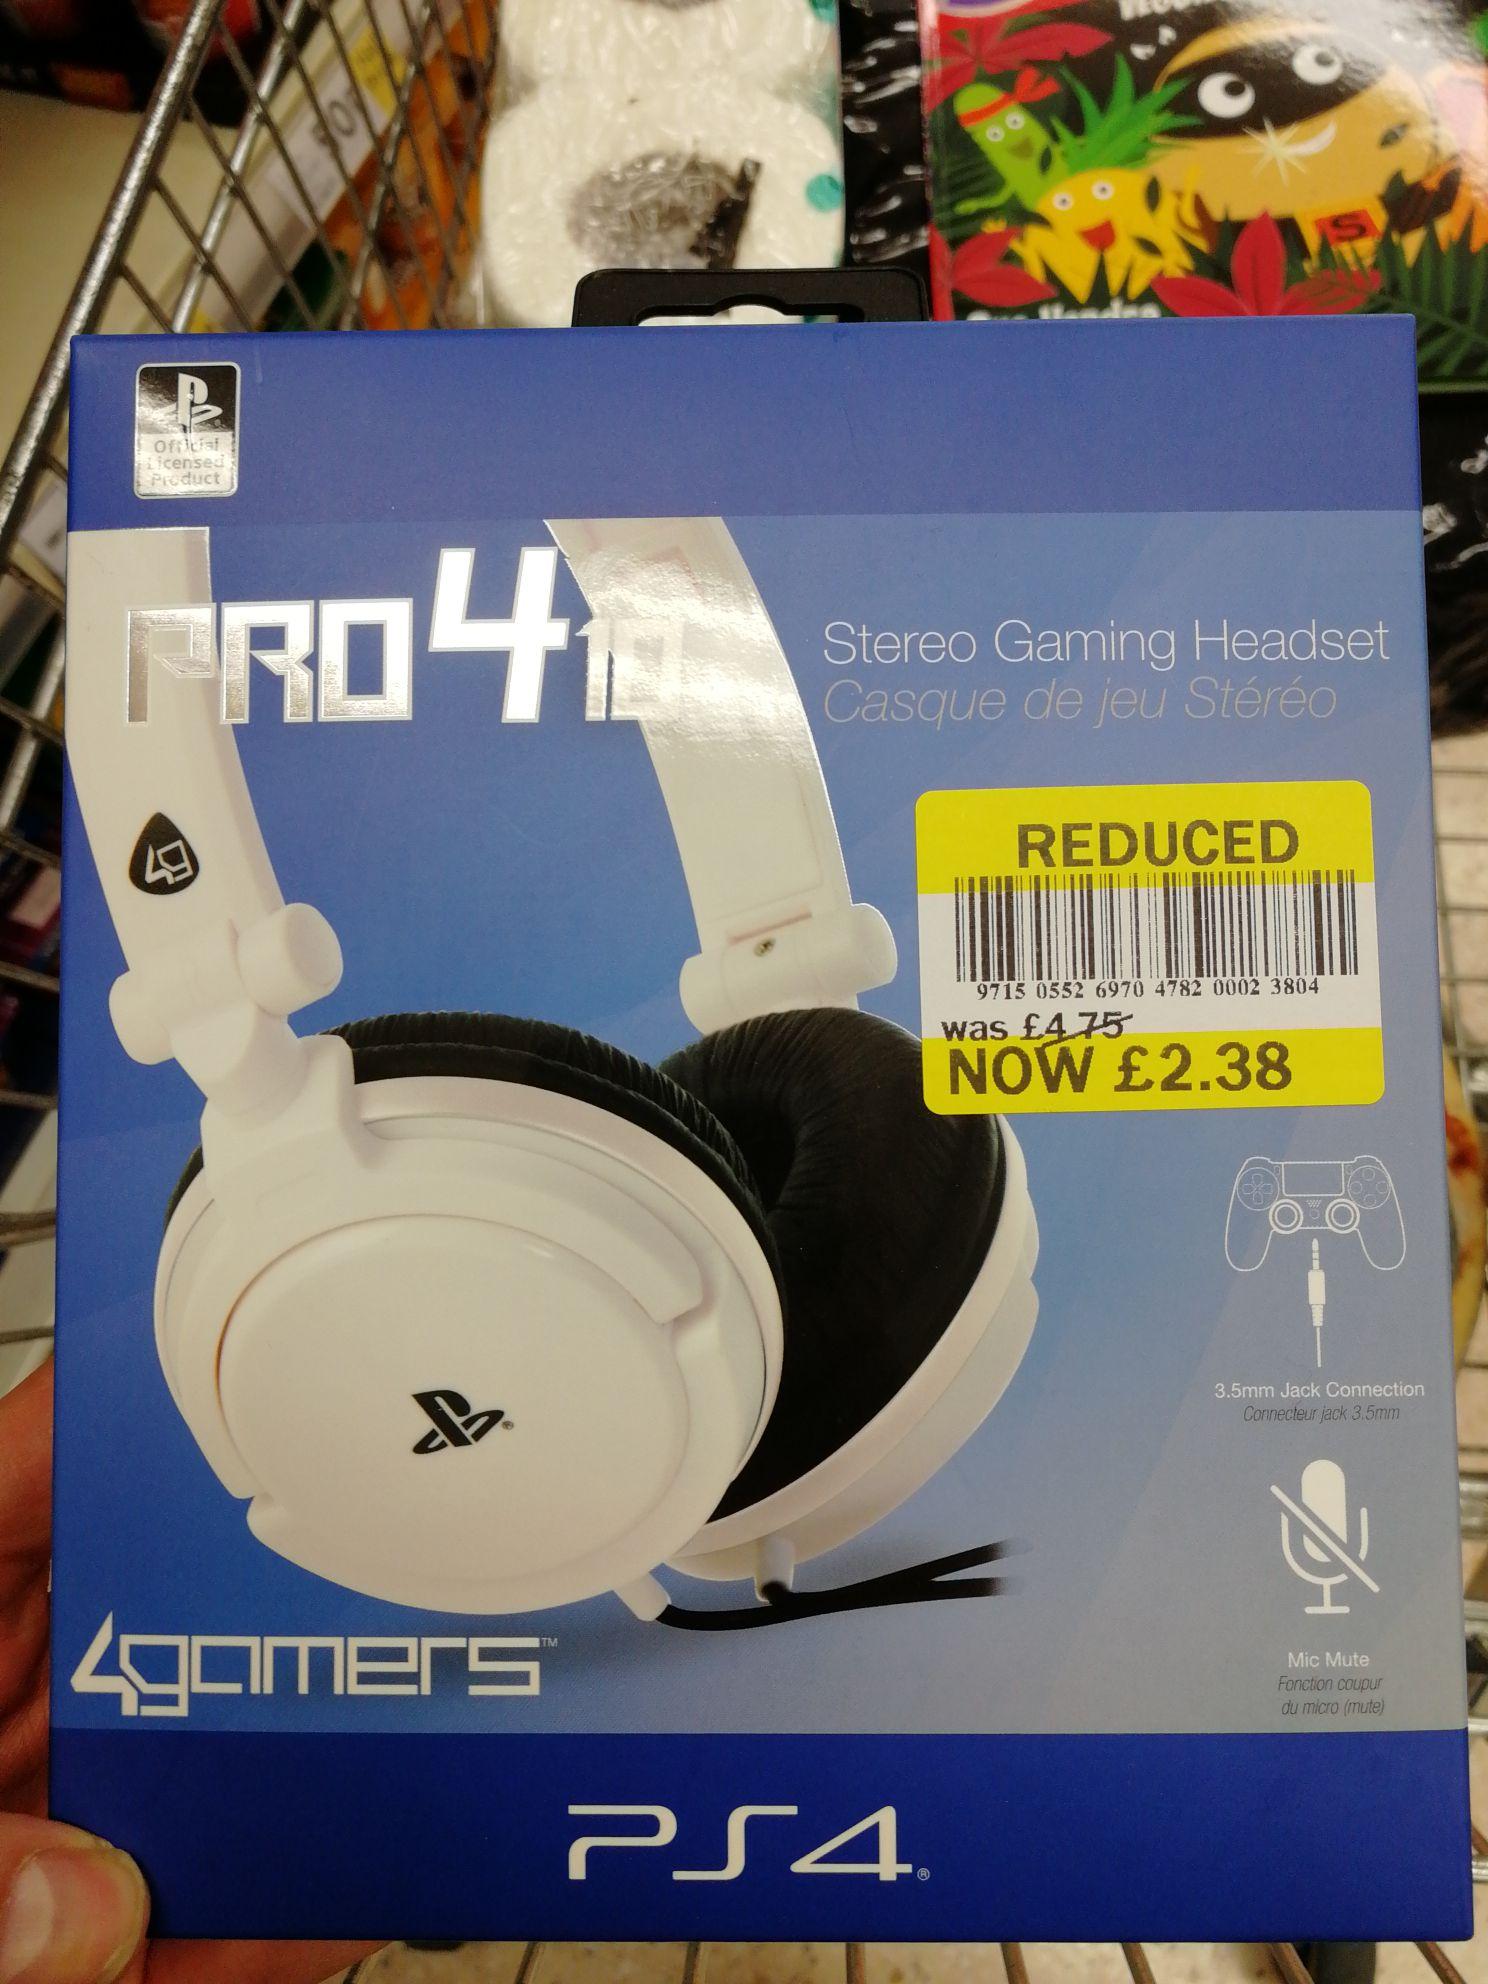 Pro 410 ps4 headset - £2.38 instore @ Tesco